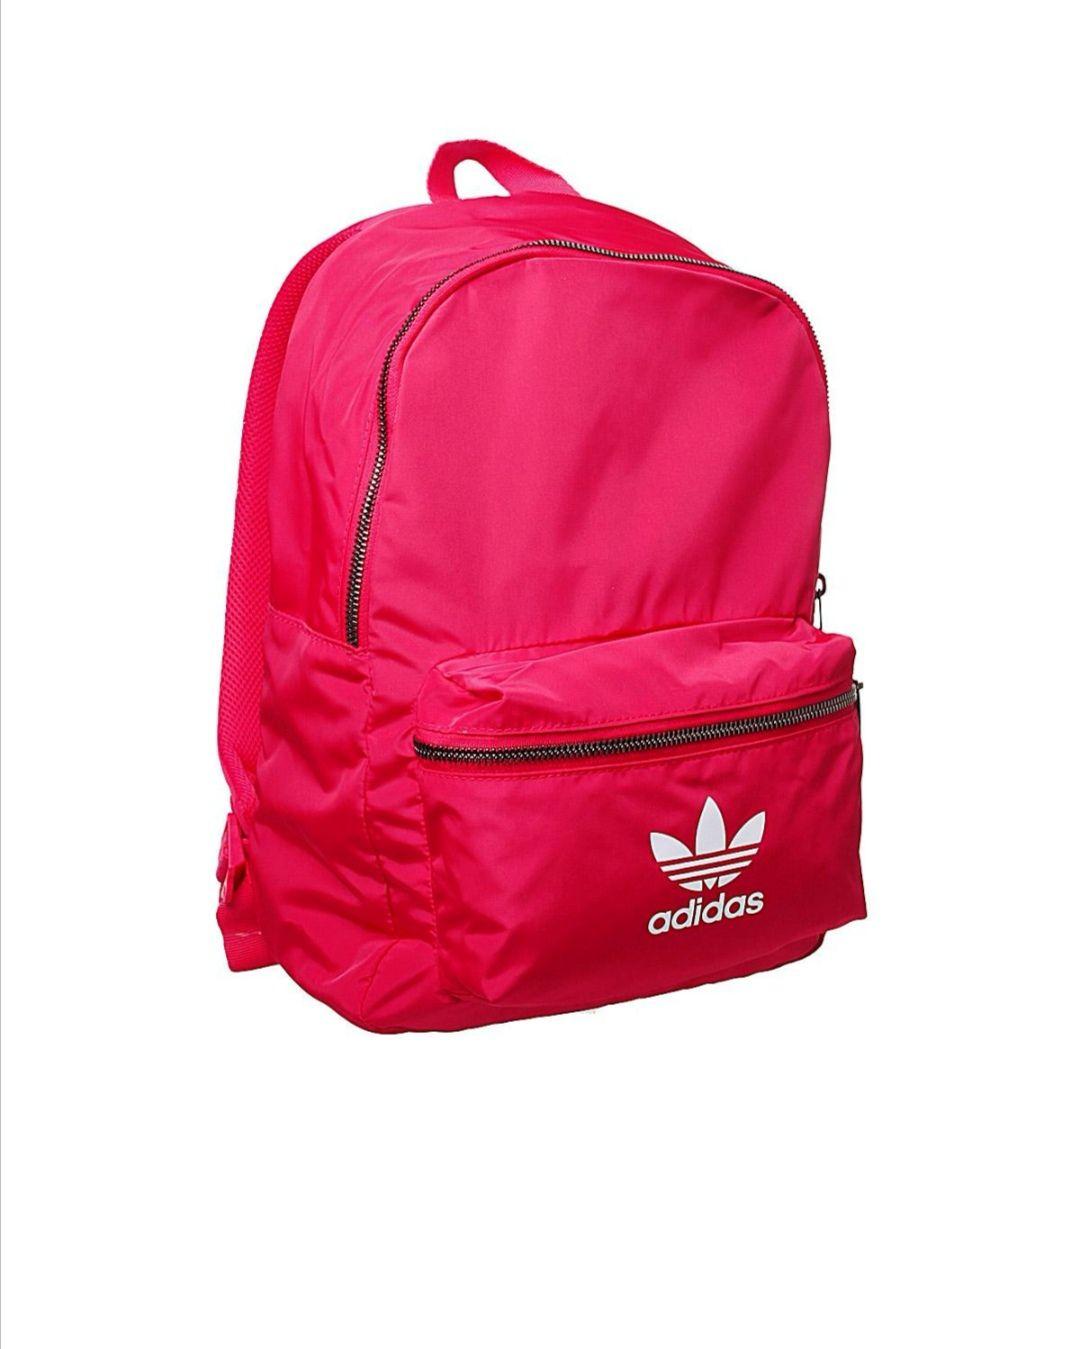 Pink Adidas Backpack £13.50 delivered @ Office